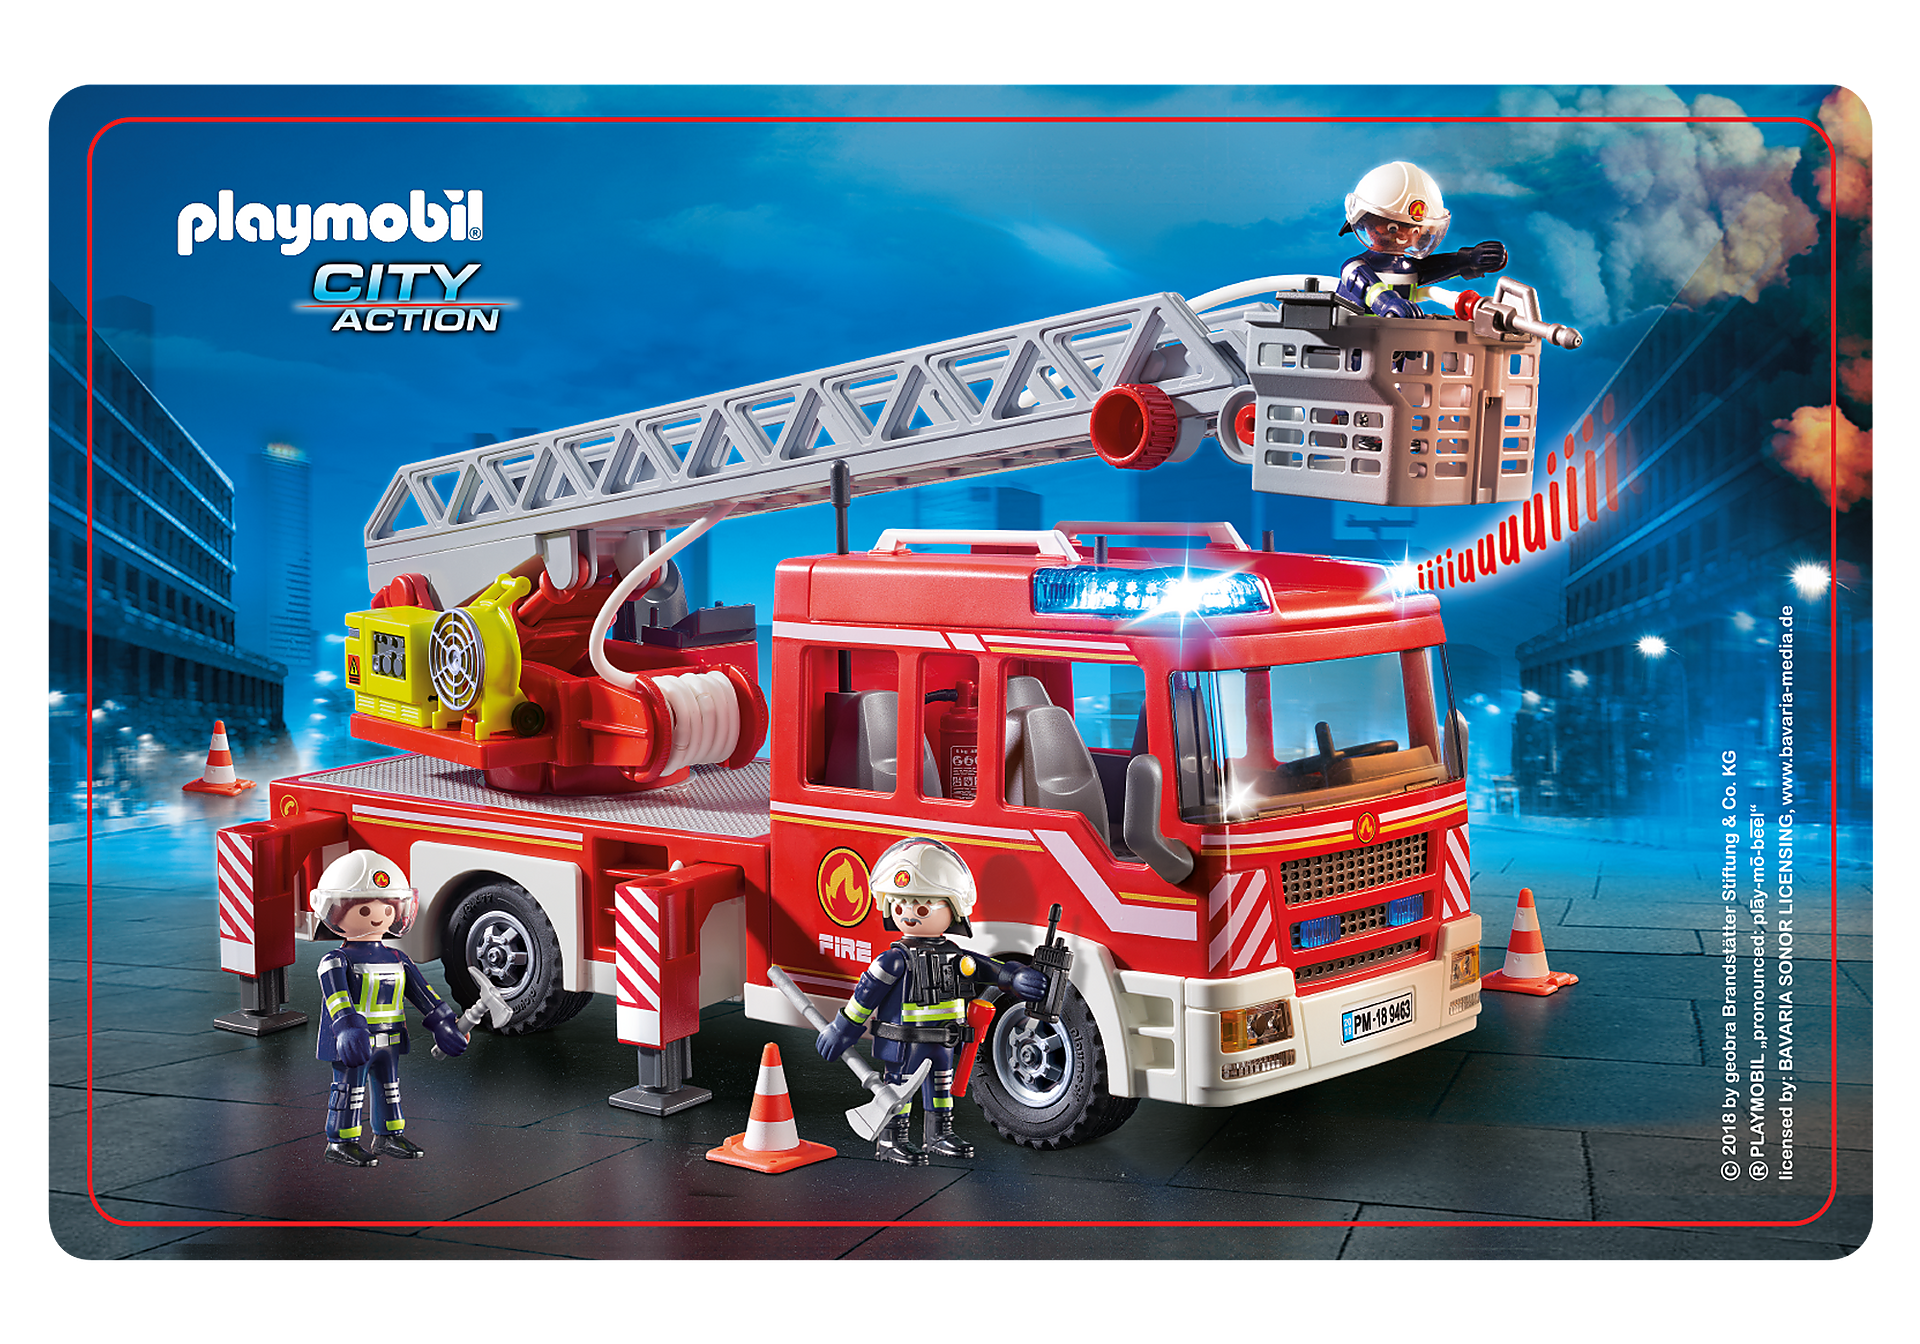 http://media.playmobil.com/i/playmobil/80155_product_extra1/Brotdose - Feuerwehr